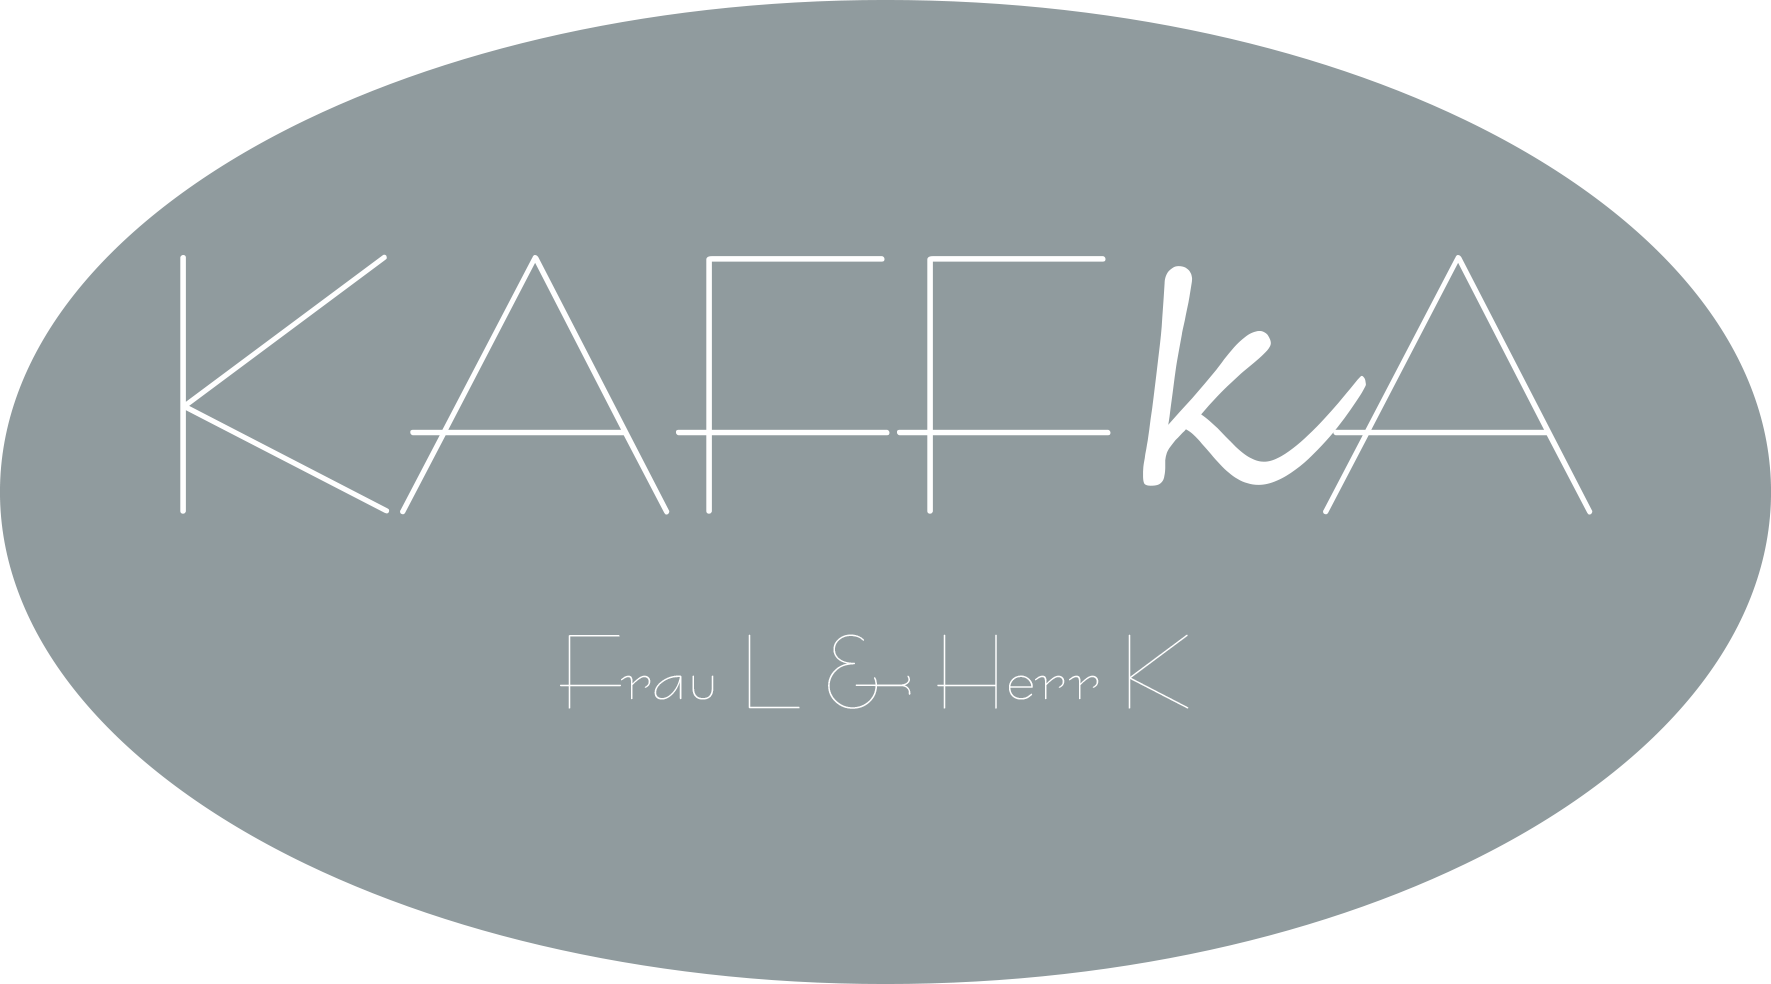 KAFFkA – Frau L. und Herr K.